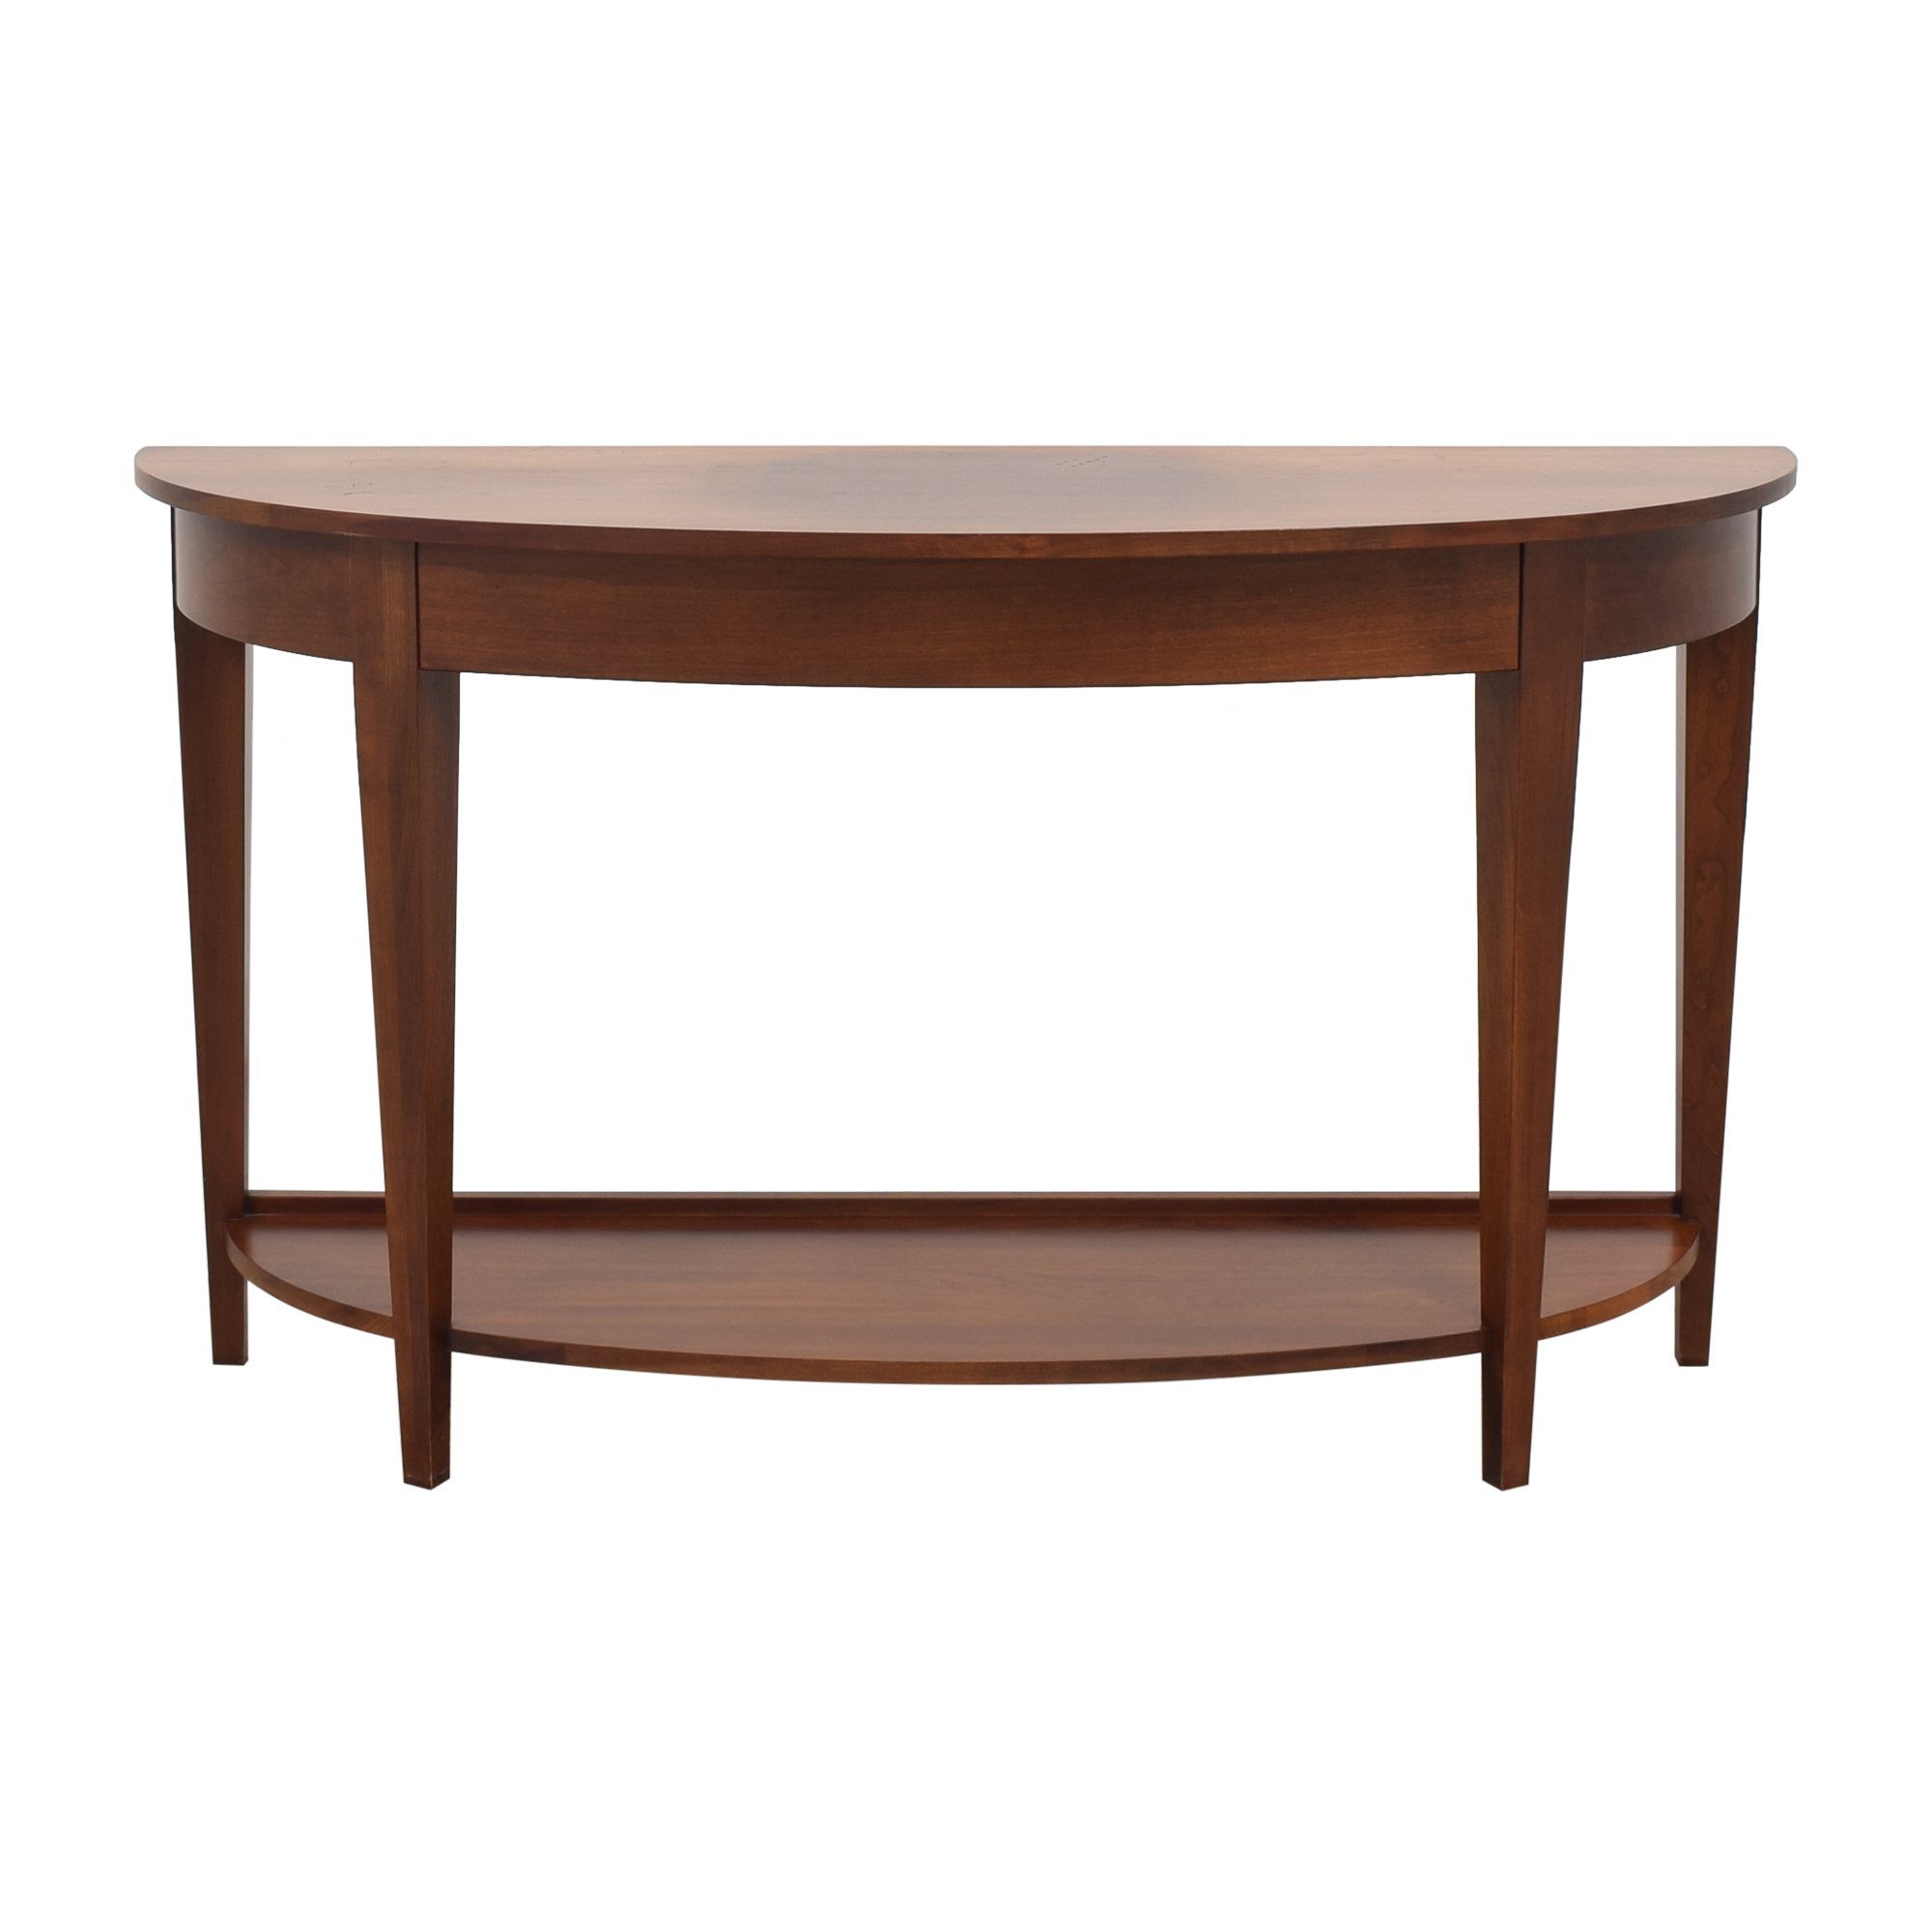 Ethan Allen Ethan Allen American Impressions Demilune Sofa Table dimensions